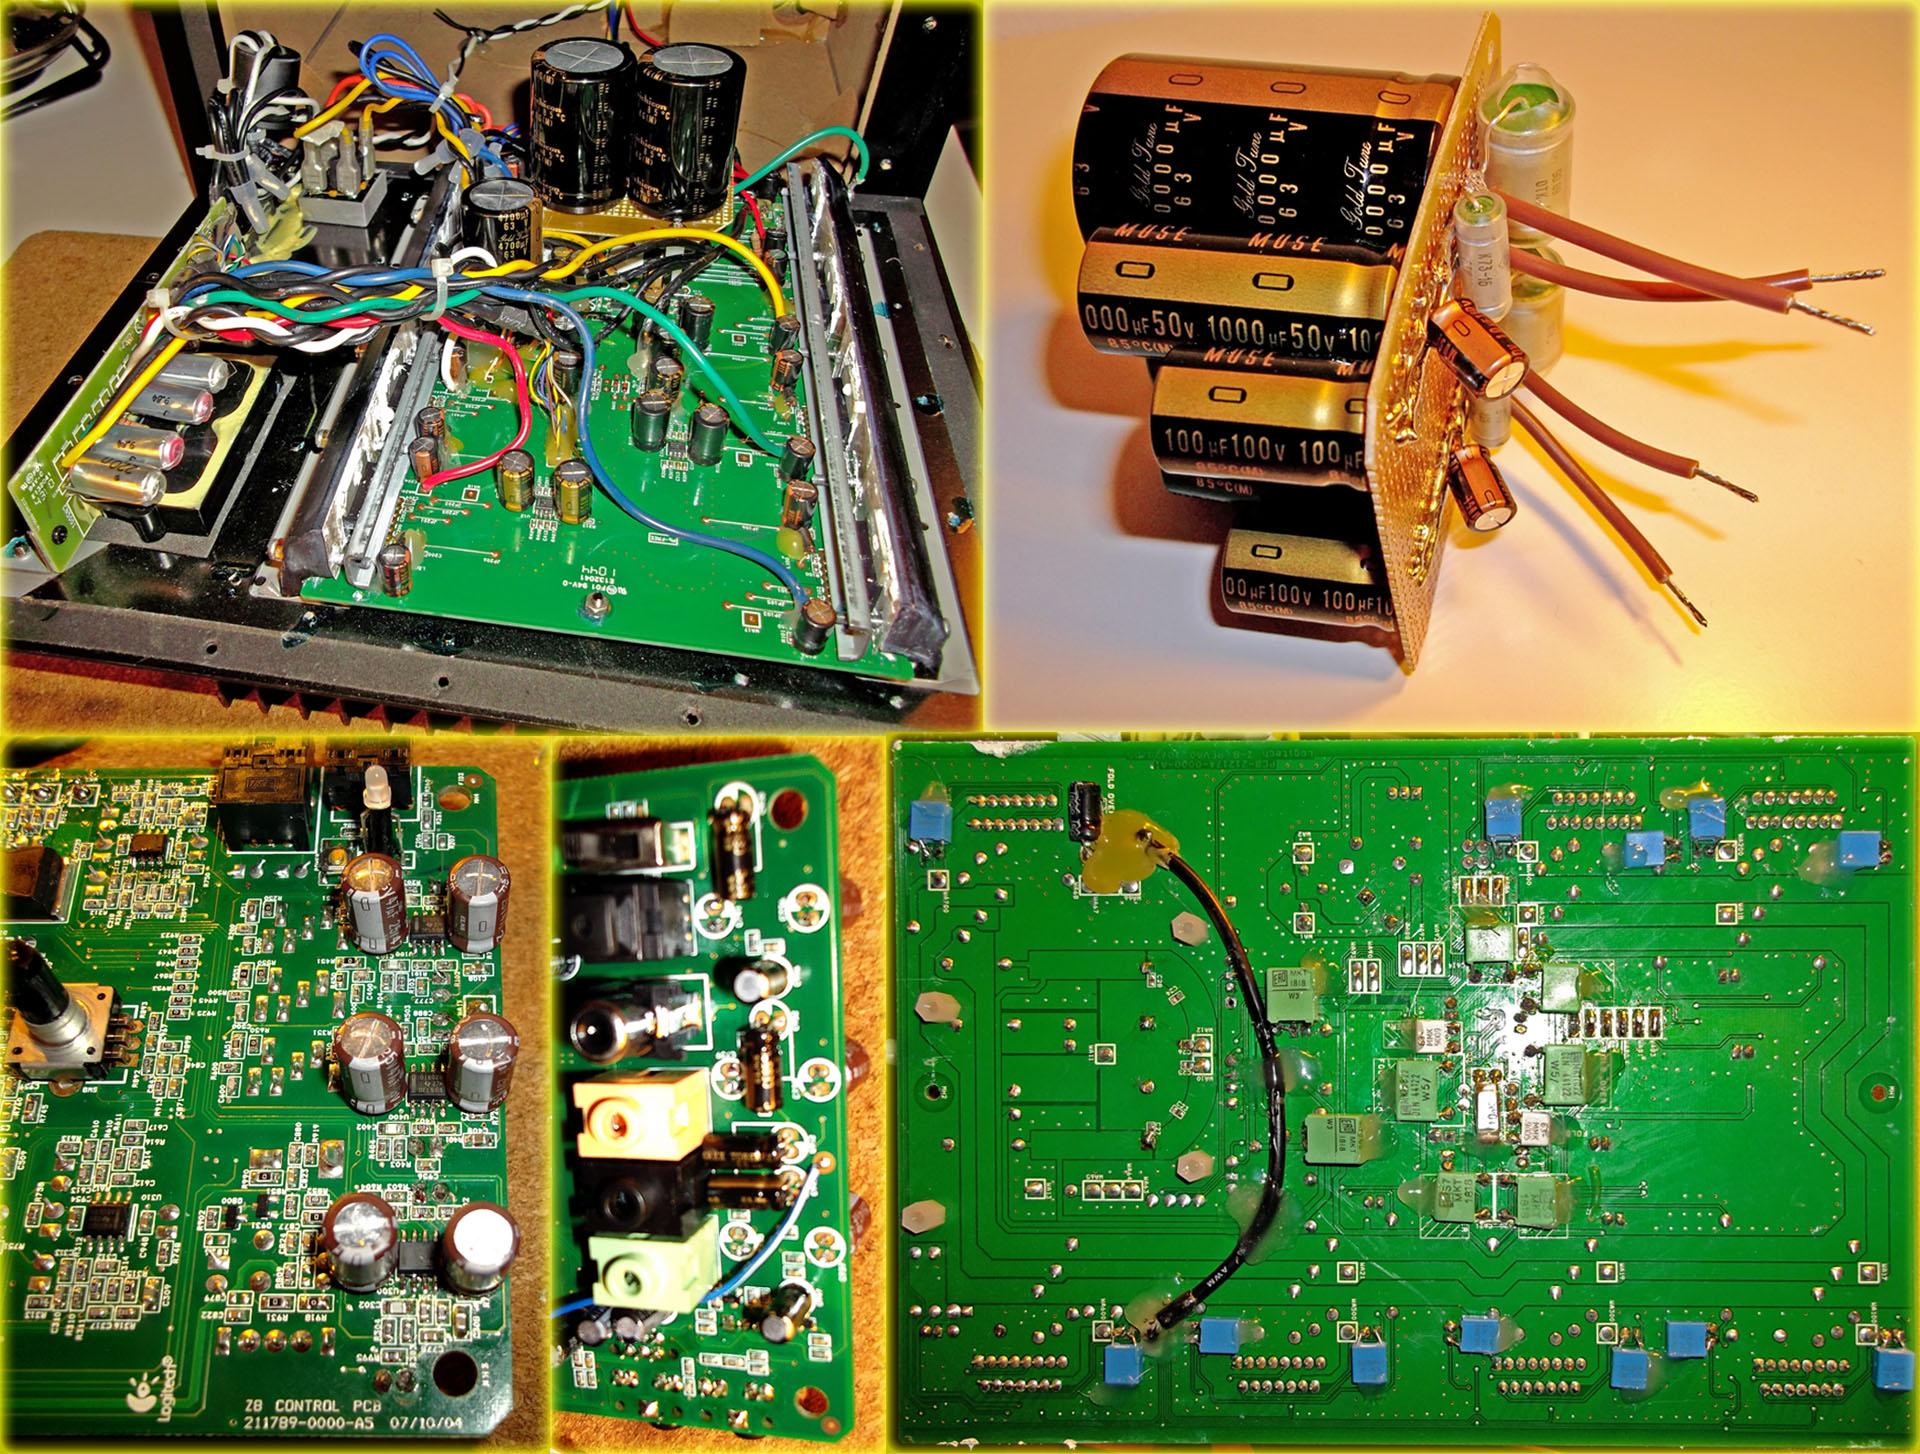 Almi's Logitech Z-5500 Mod (High-End upgrade for the speaker